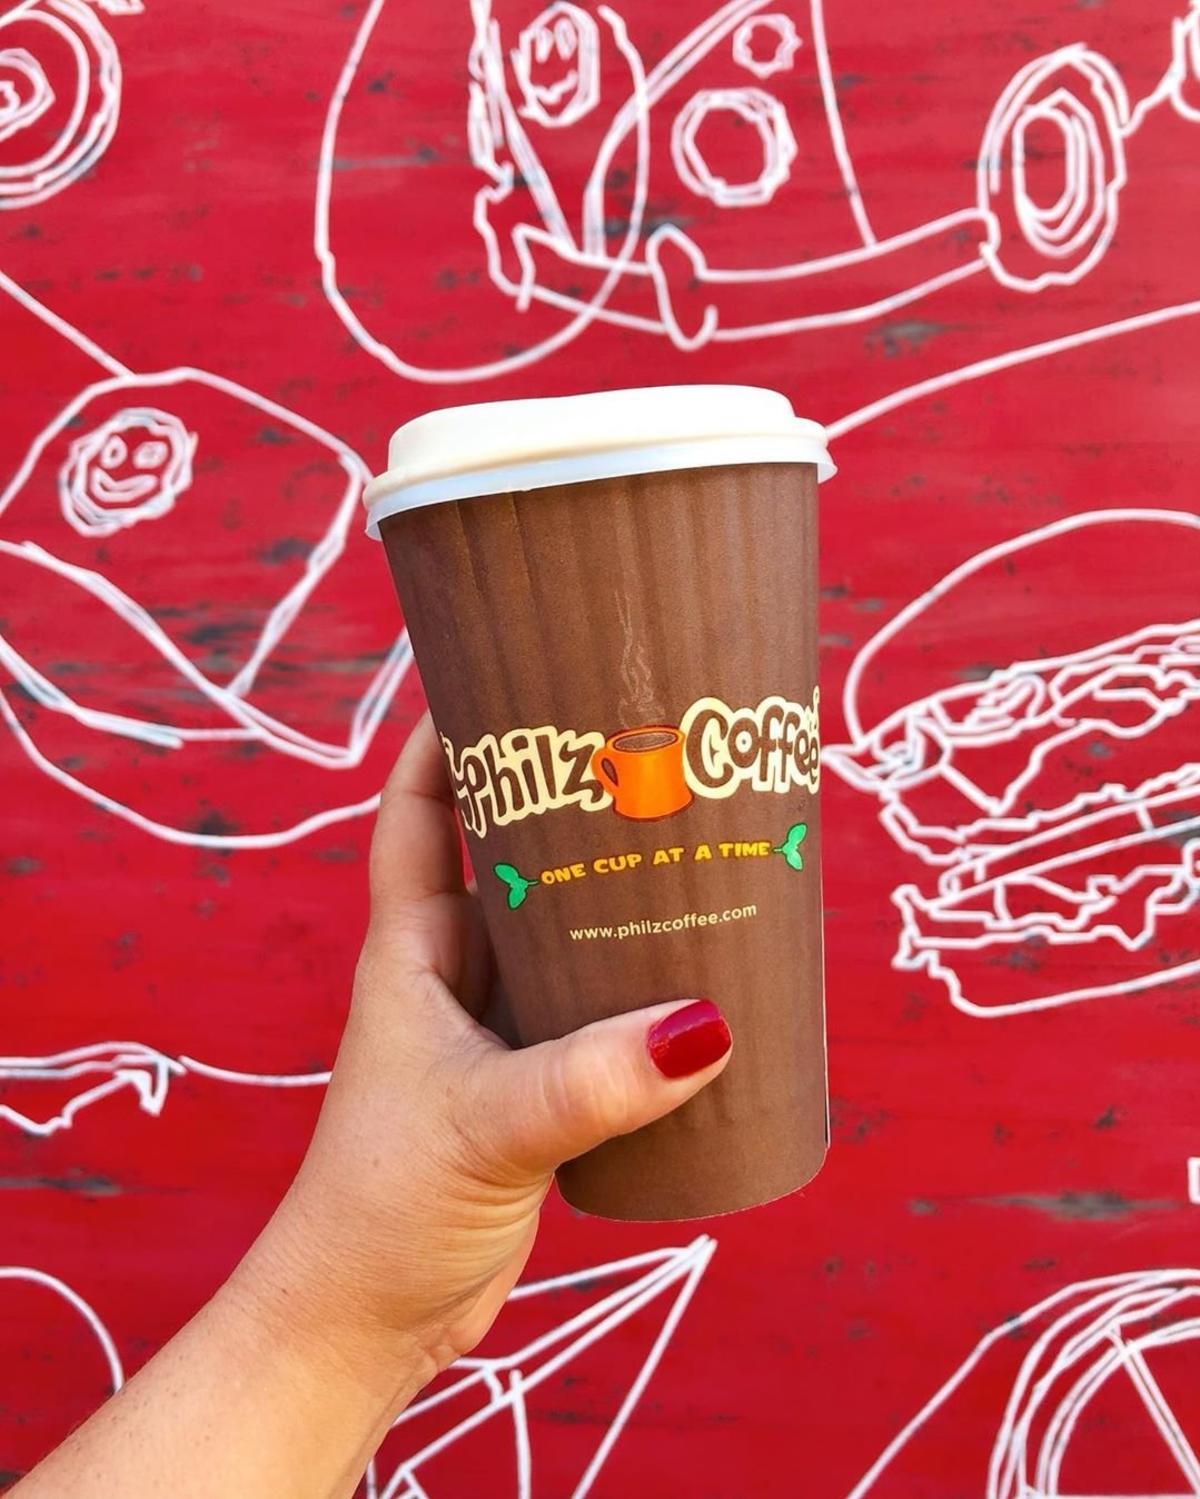 Philz Coffee in Pacific City